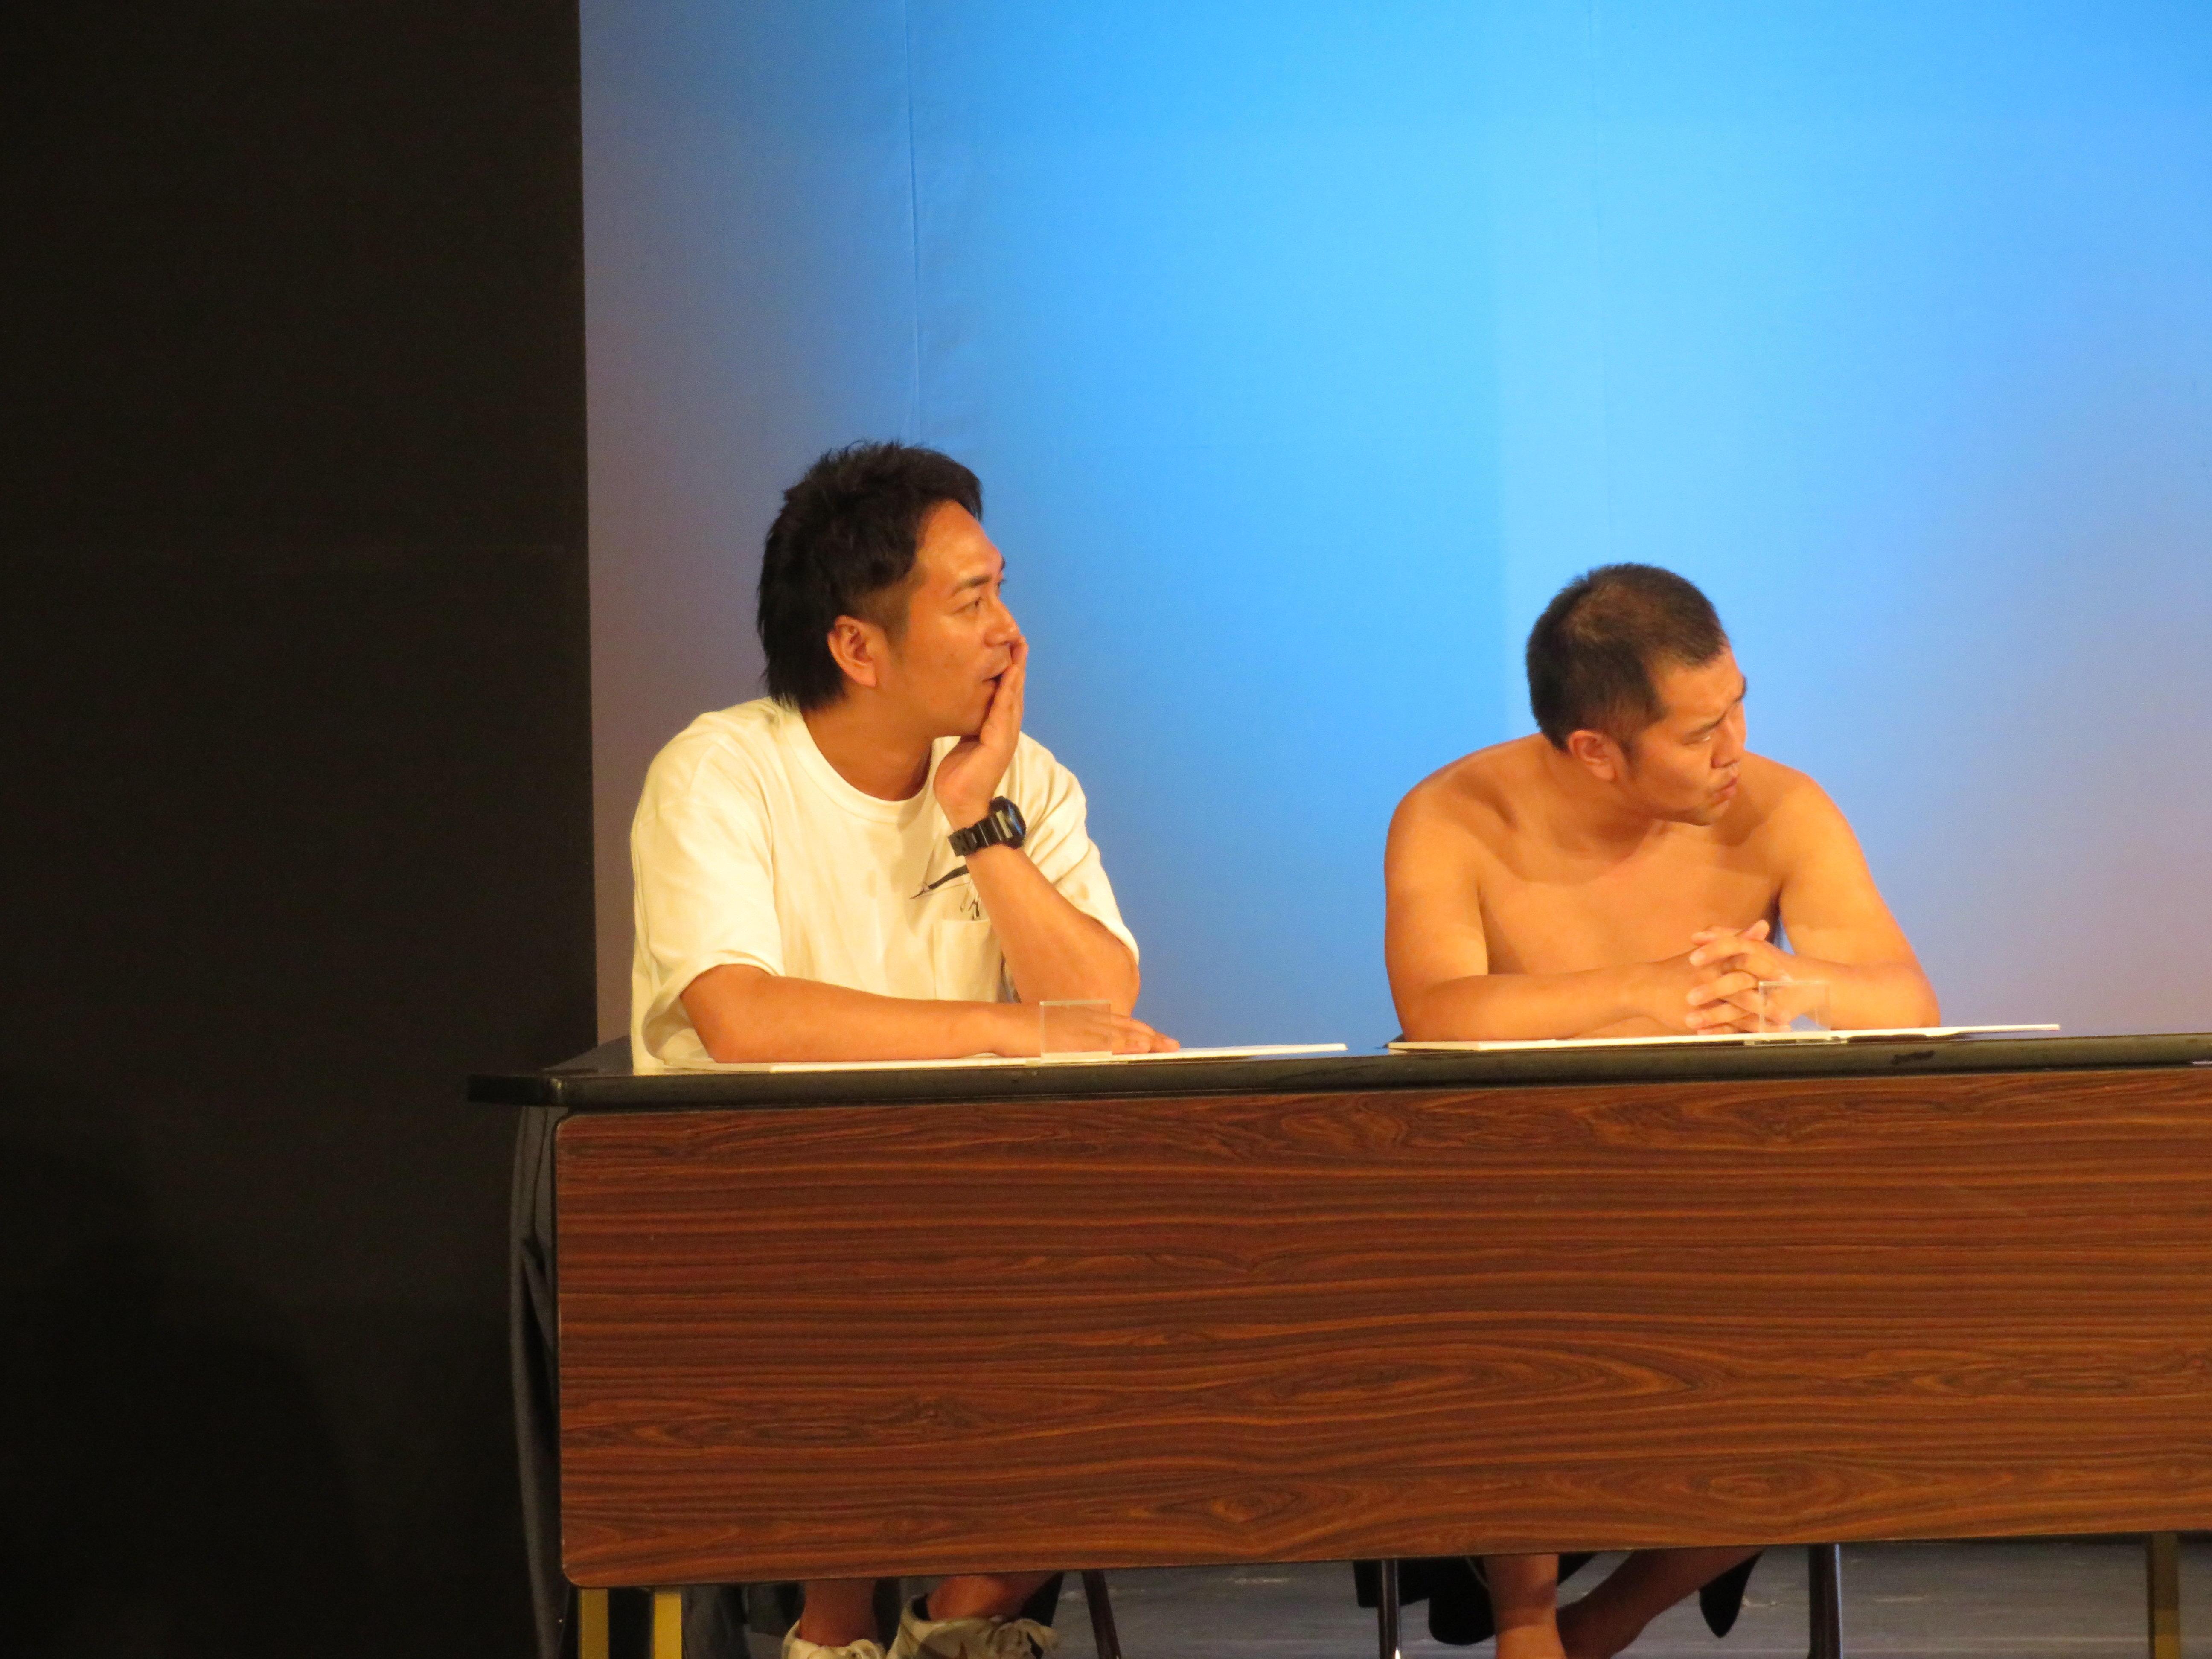 http://news.yoshimoto.co.jp/20170803163317-7c064538327aecacff02baab84654768996a6691.jpg